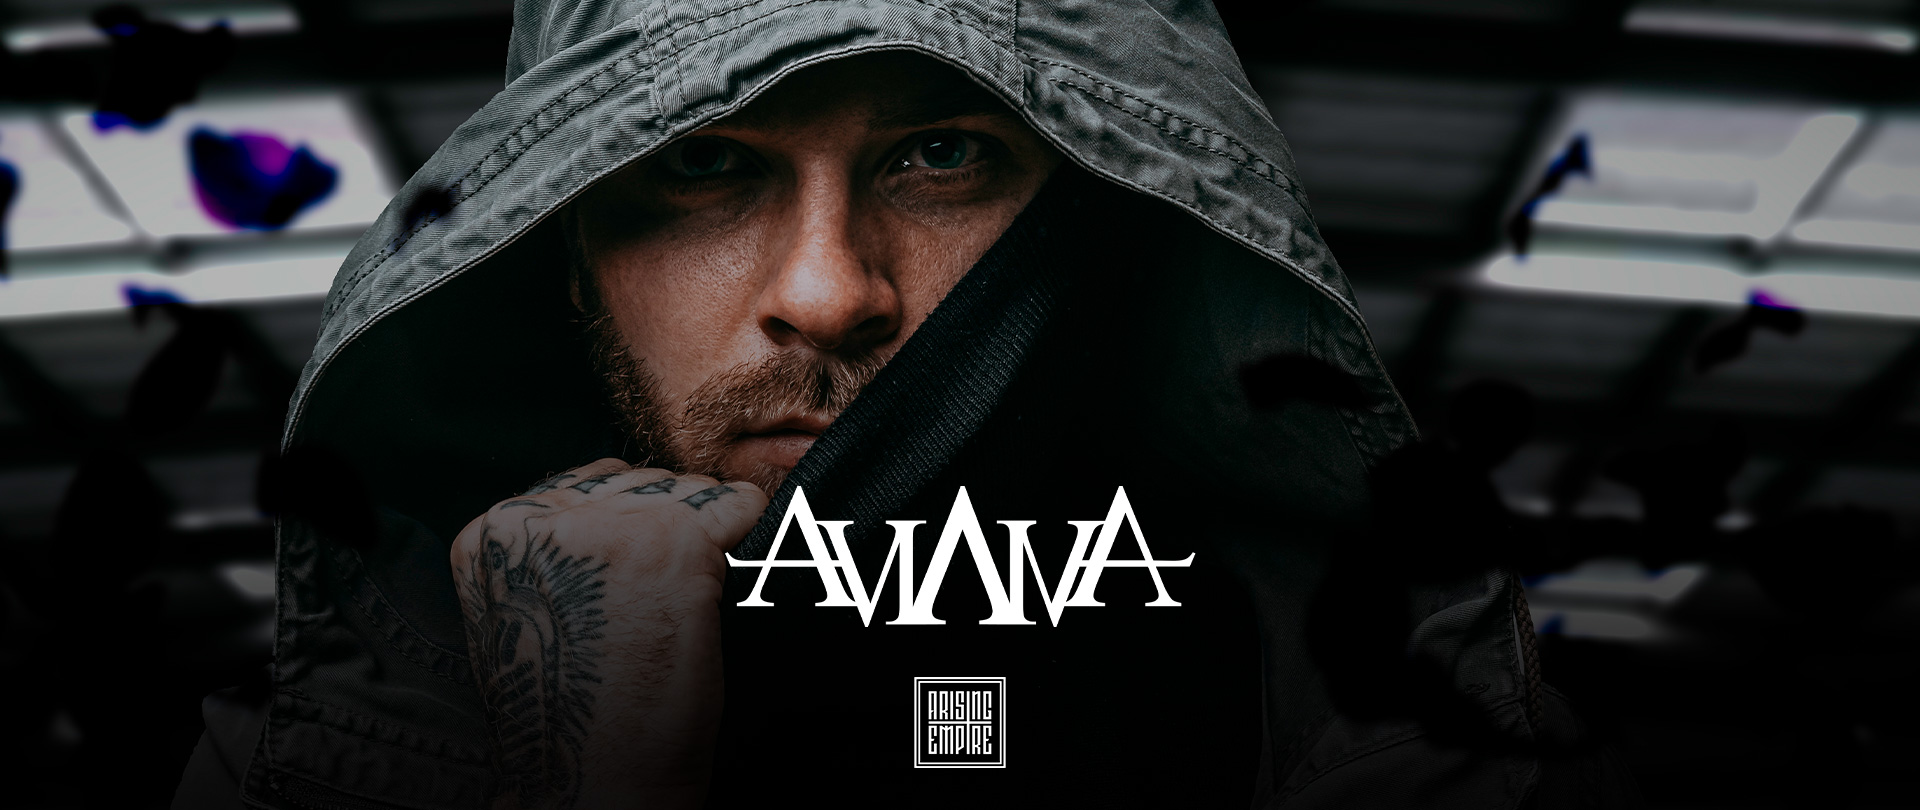 Aviana at Arising Empire • Offizieller Online Shop